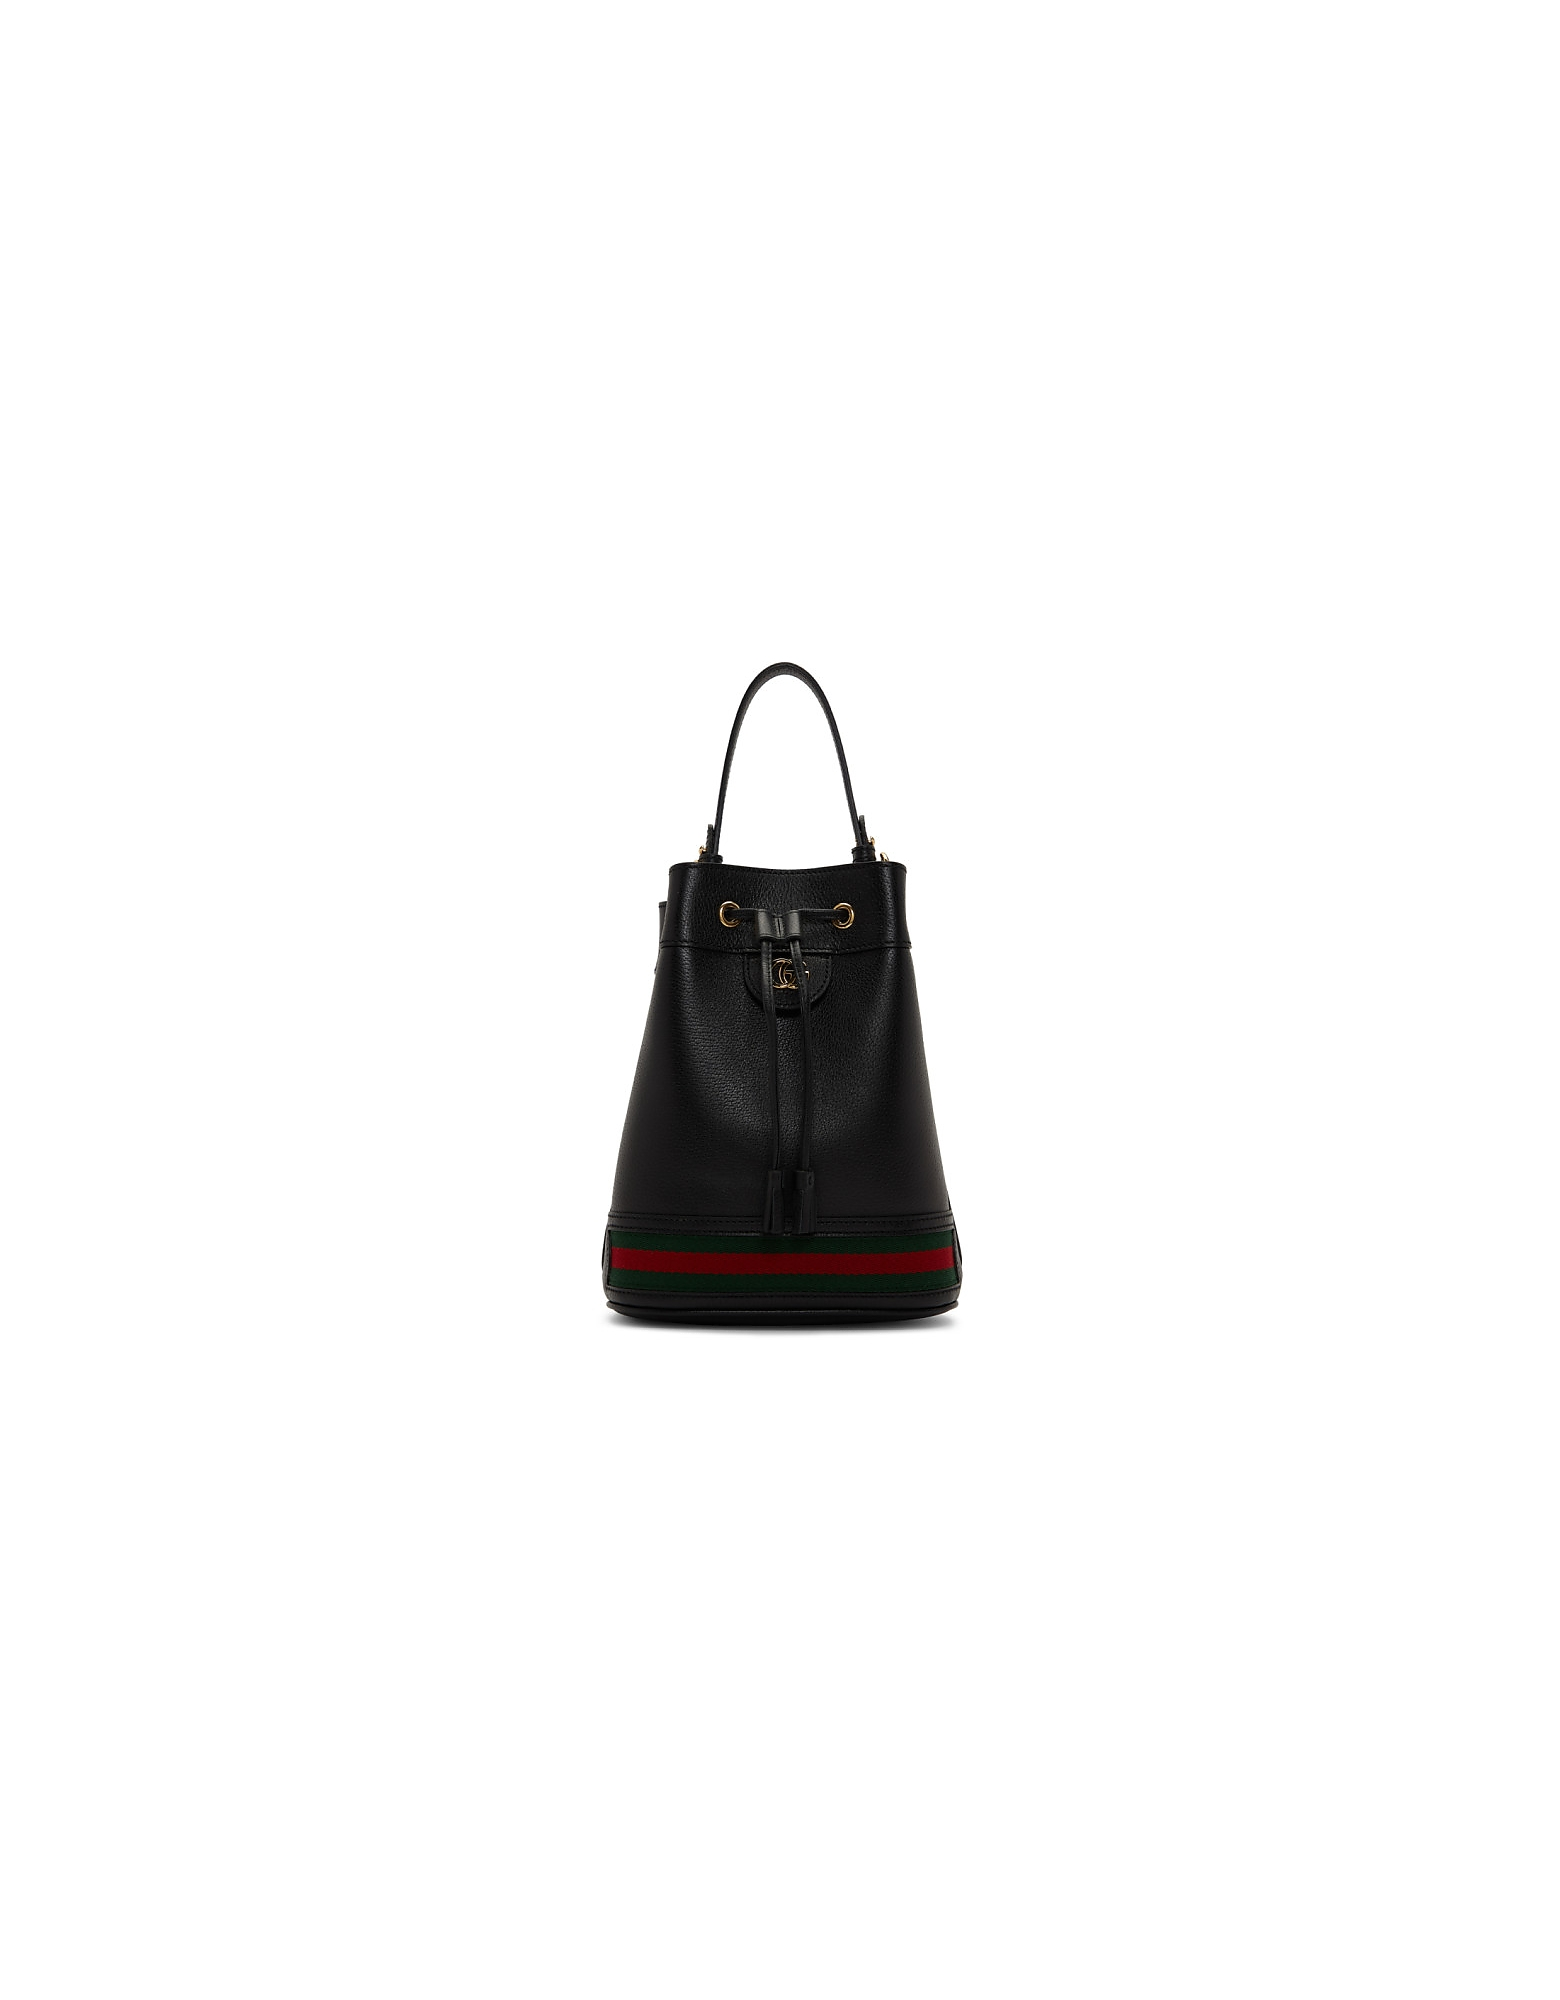 Gucci Designer Handbags, Black Ophidia Bucket Bag